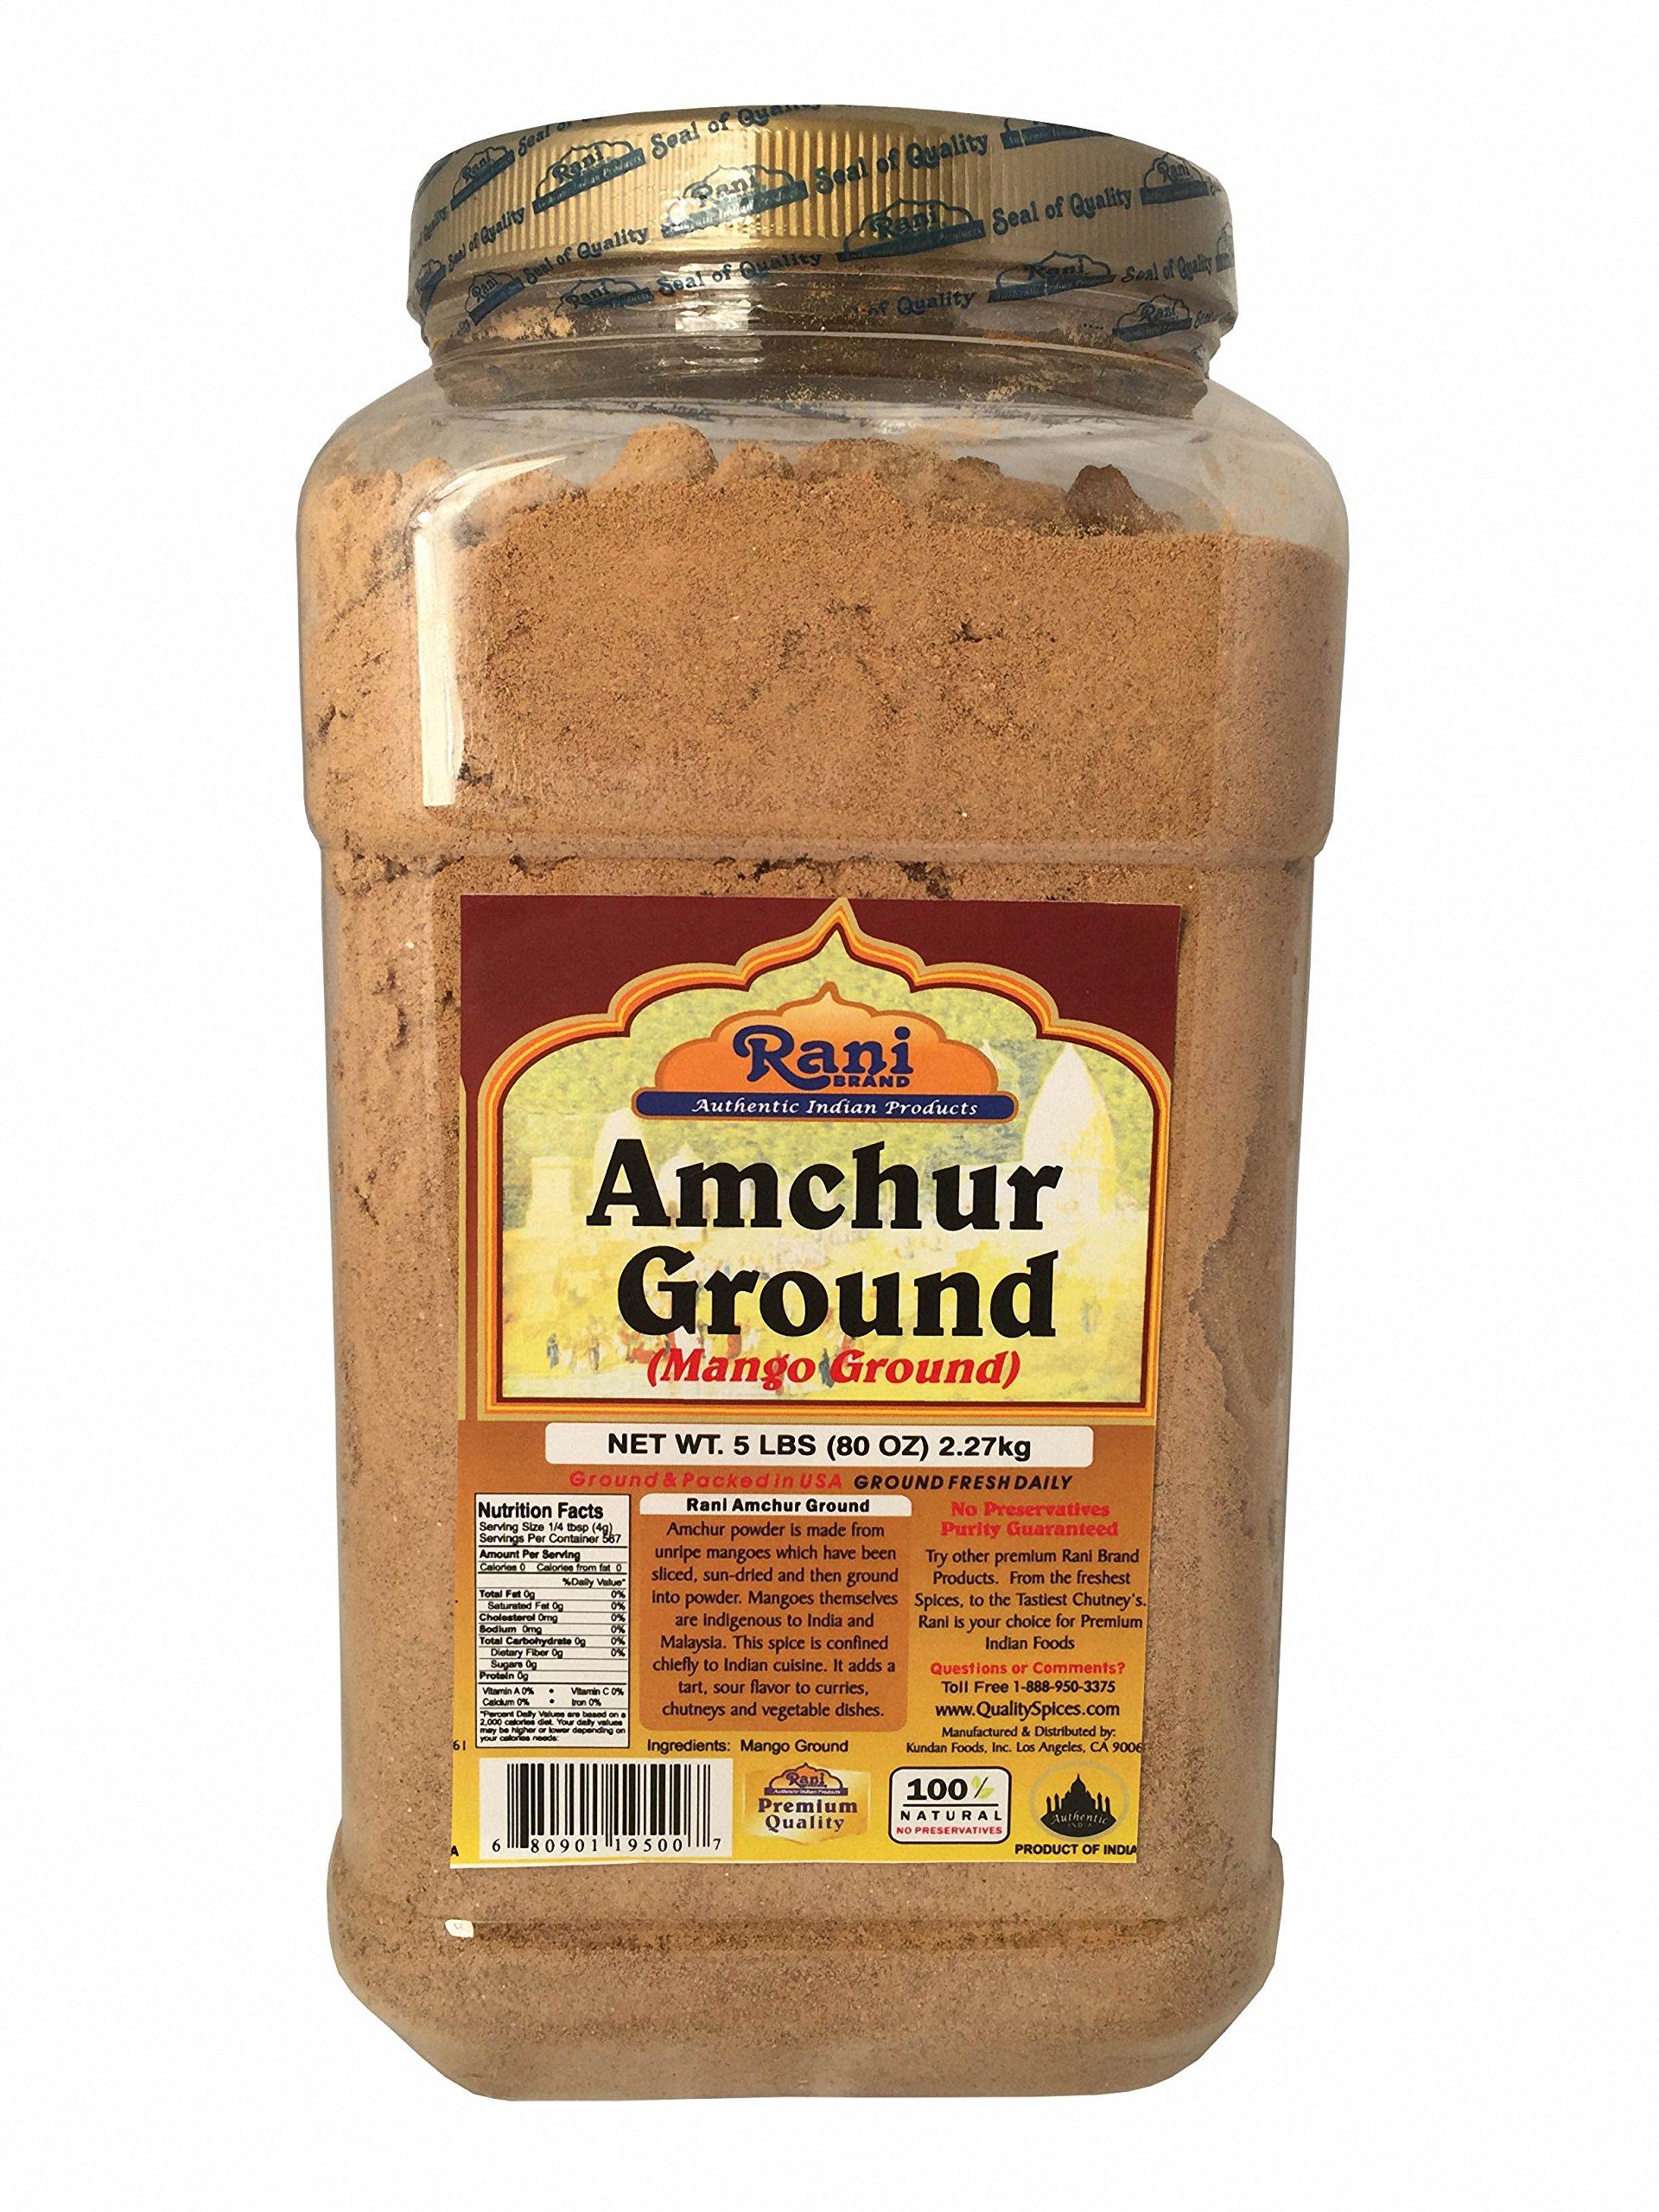 Rani Amchur (Mango) Ground 5lbs (80oz) Bulk, PET Jar ~ All Natural, Indian Origin | No Color | Gluten Free Ingredients | Vegan | NON-GMO | No Salt or fillers